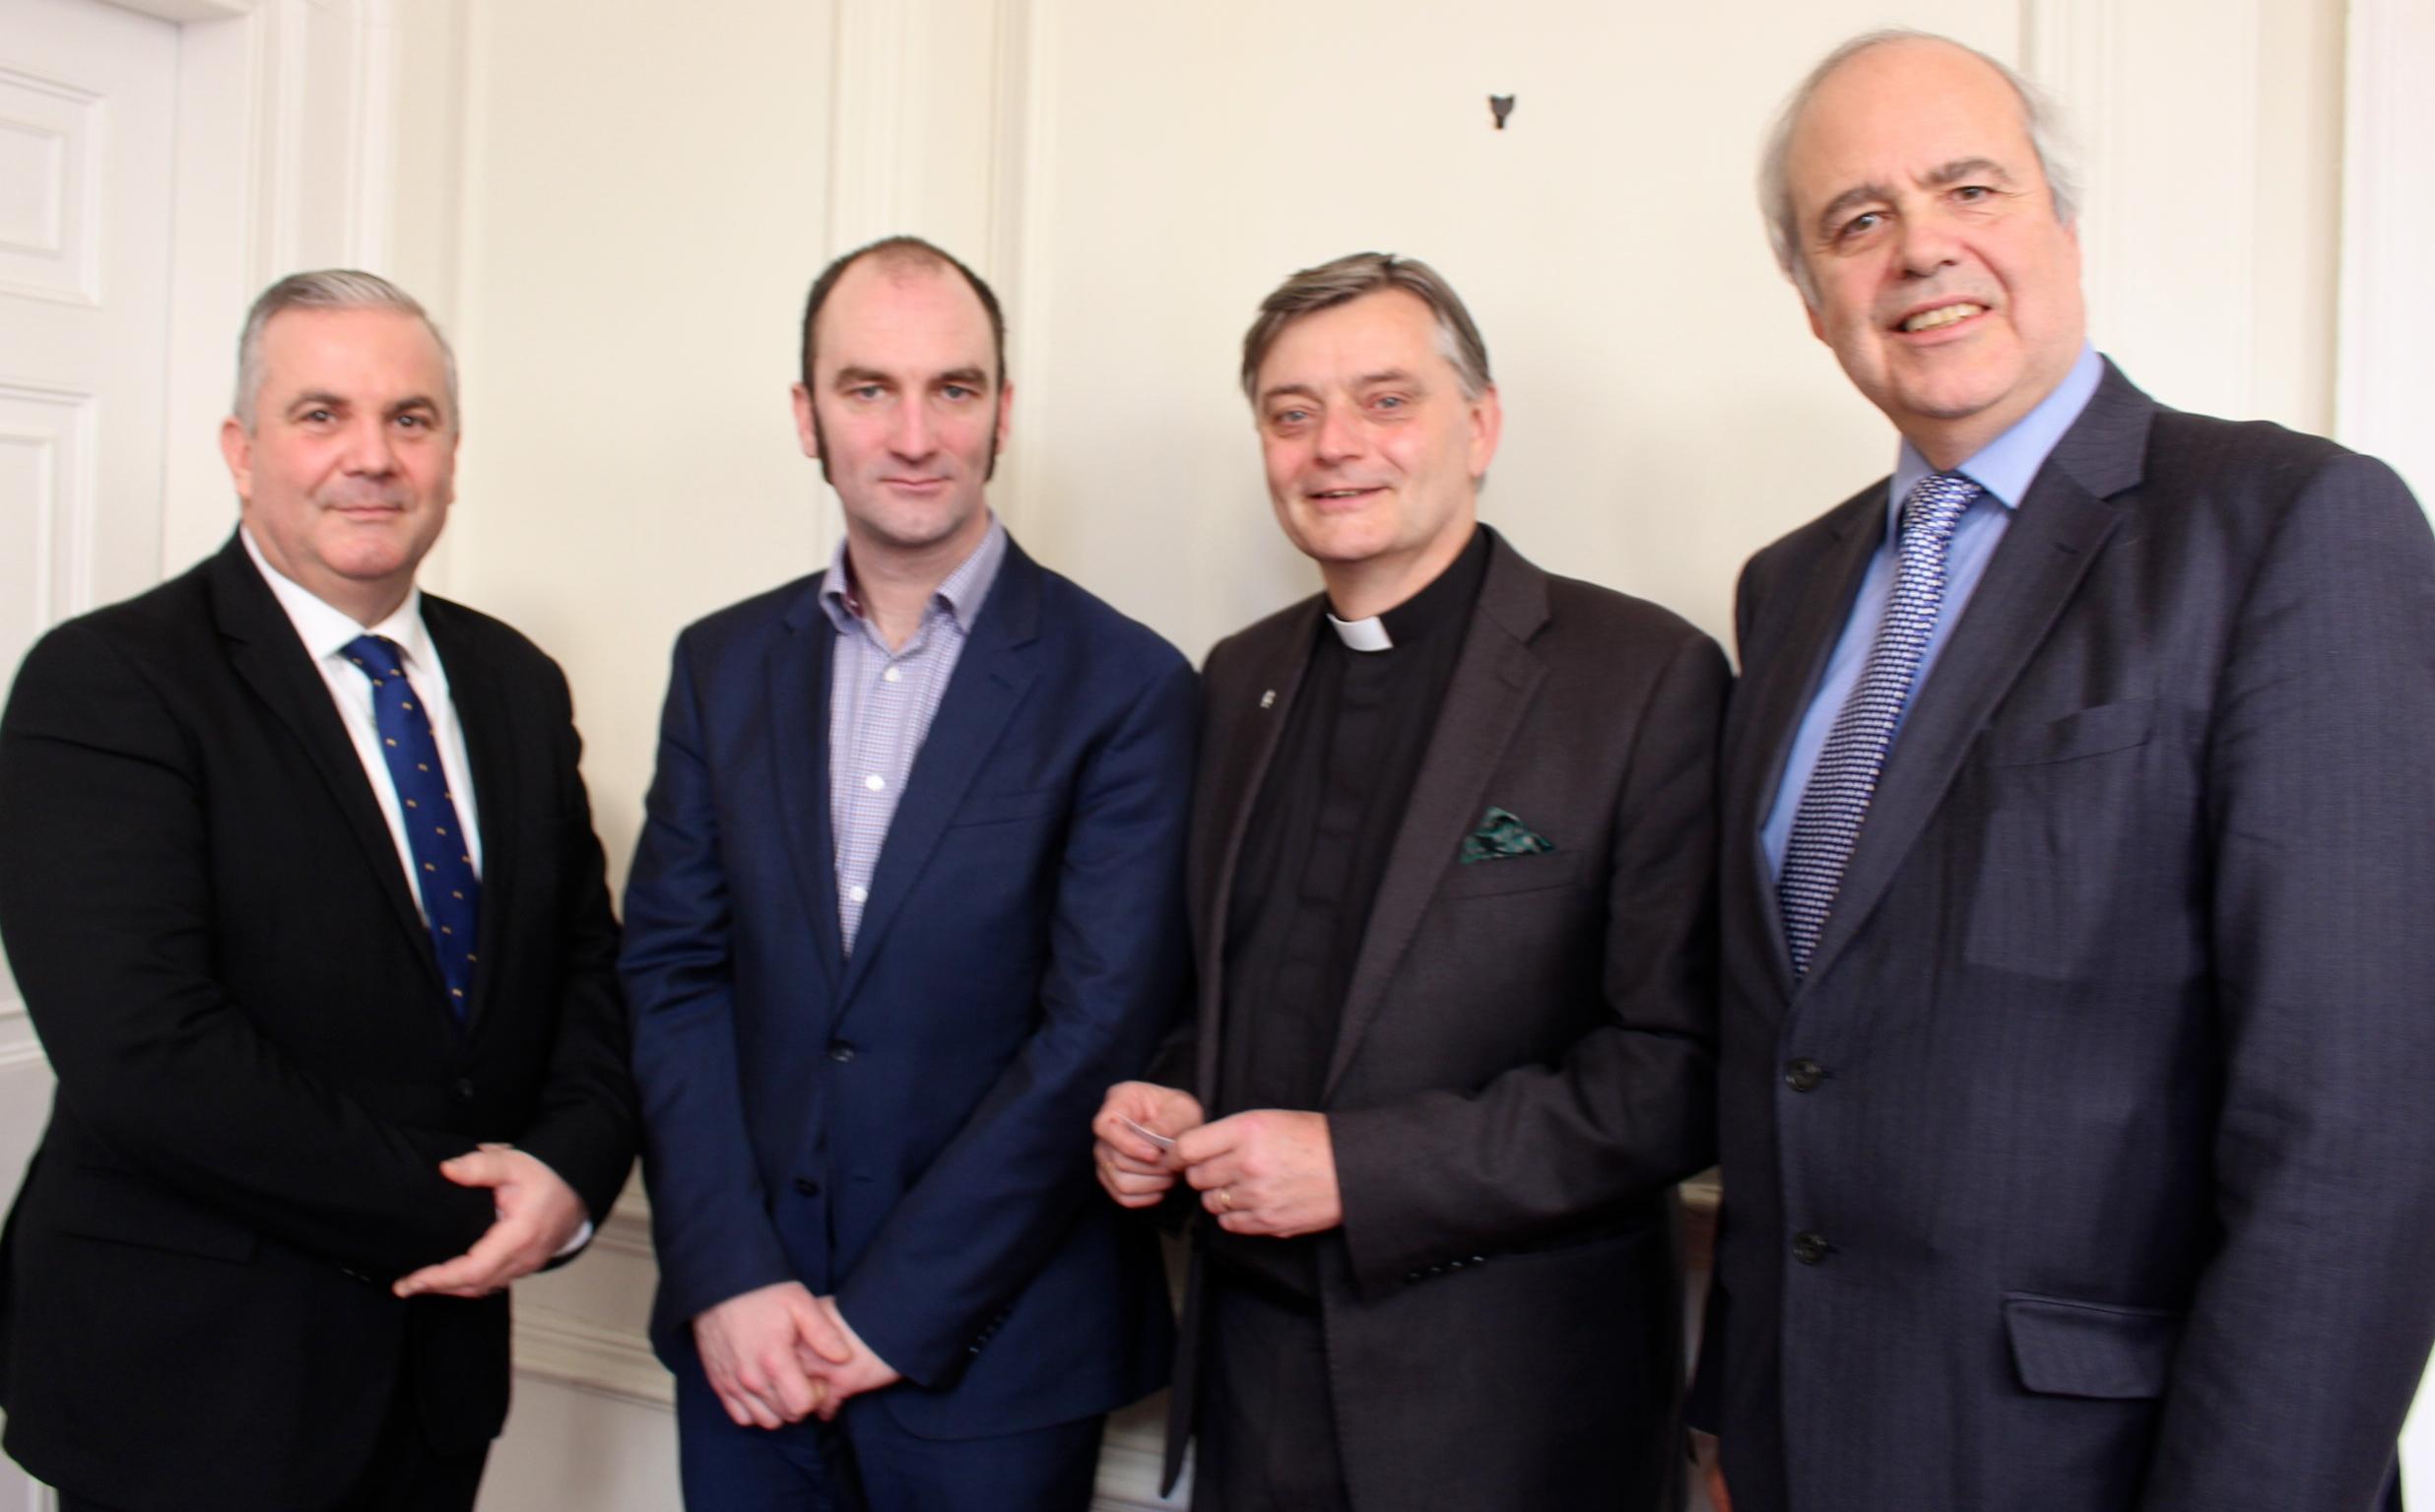 Photo caption: Changing North Kent – (from left) David Ward, Matthew Norwell, Philip Hesketh (Dean of Rochester) and Gordon Pratt